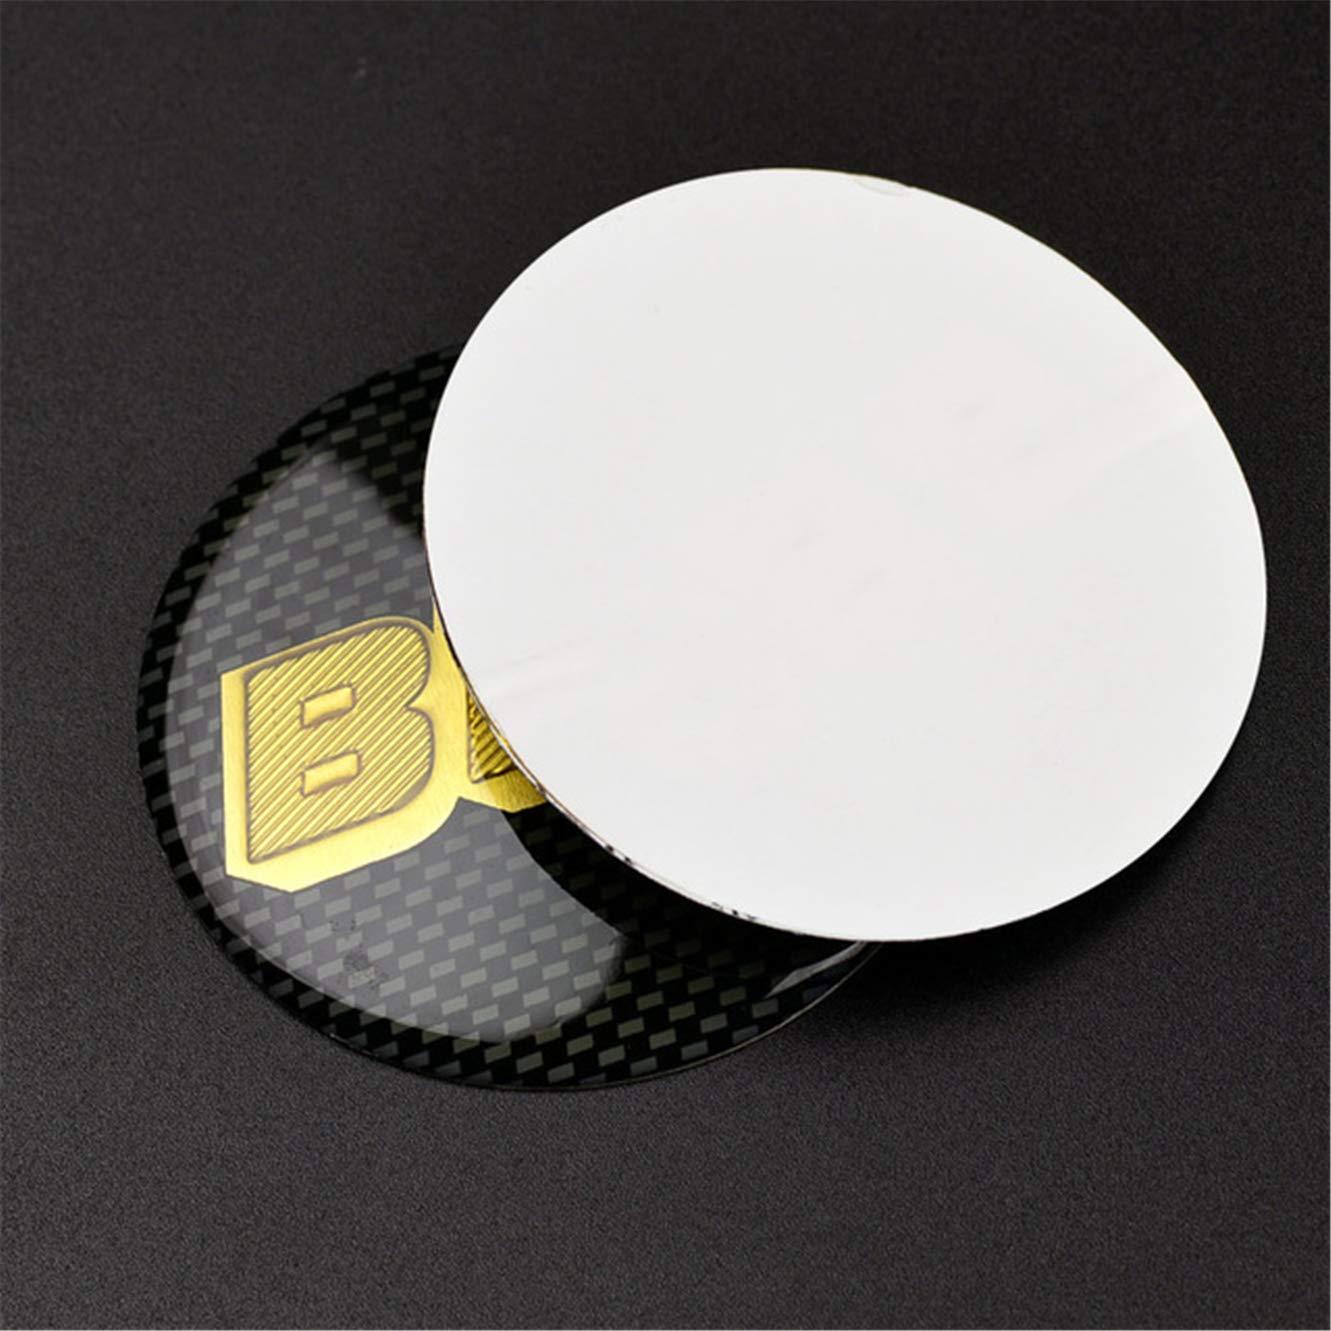 Amazon com gangjianlan 4pcs 65mm curved auto wheel center cap stickers car styling embelms for bbs black gold plaid automotive